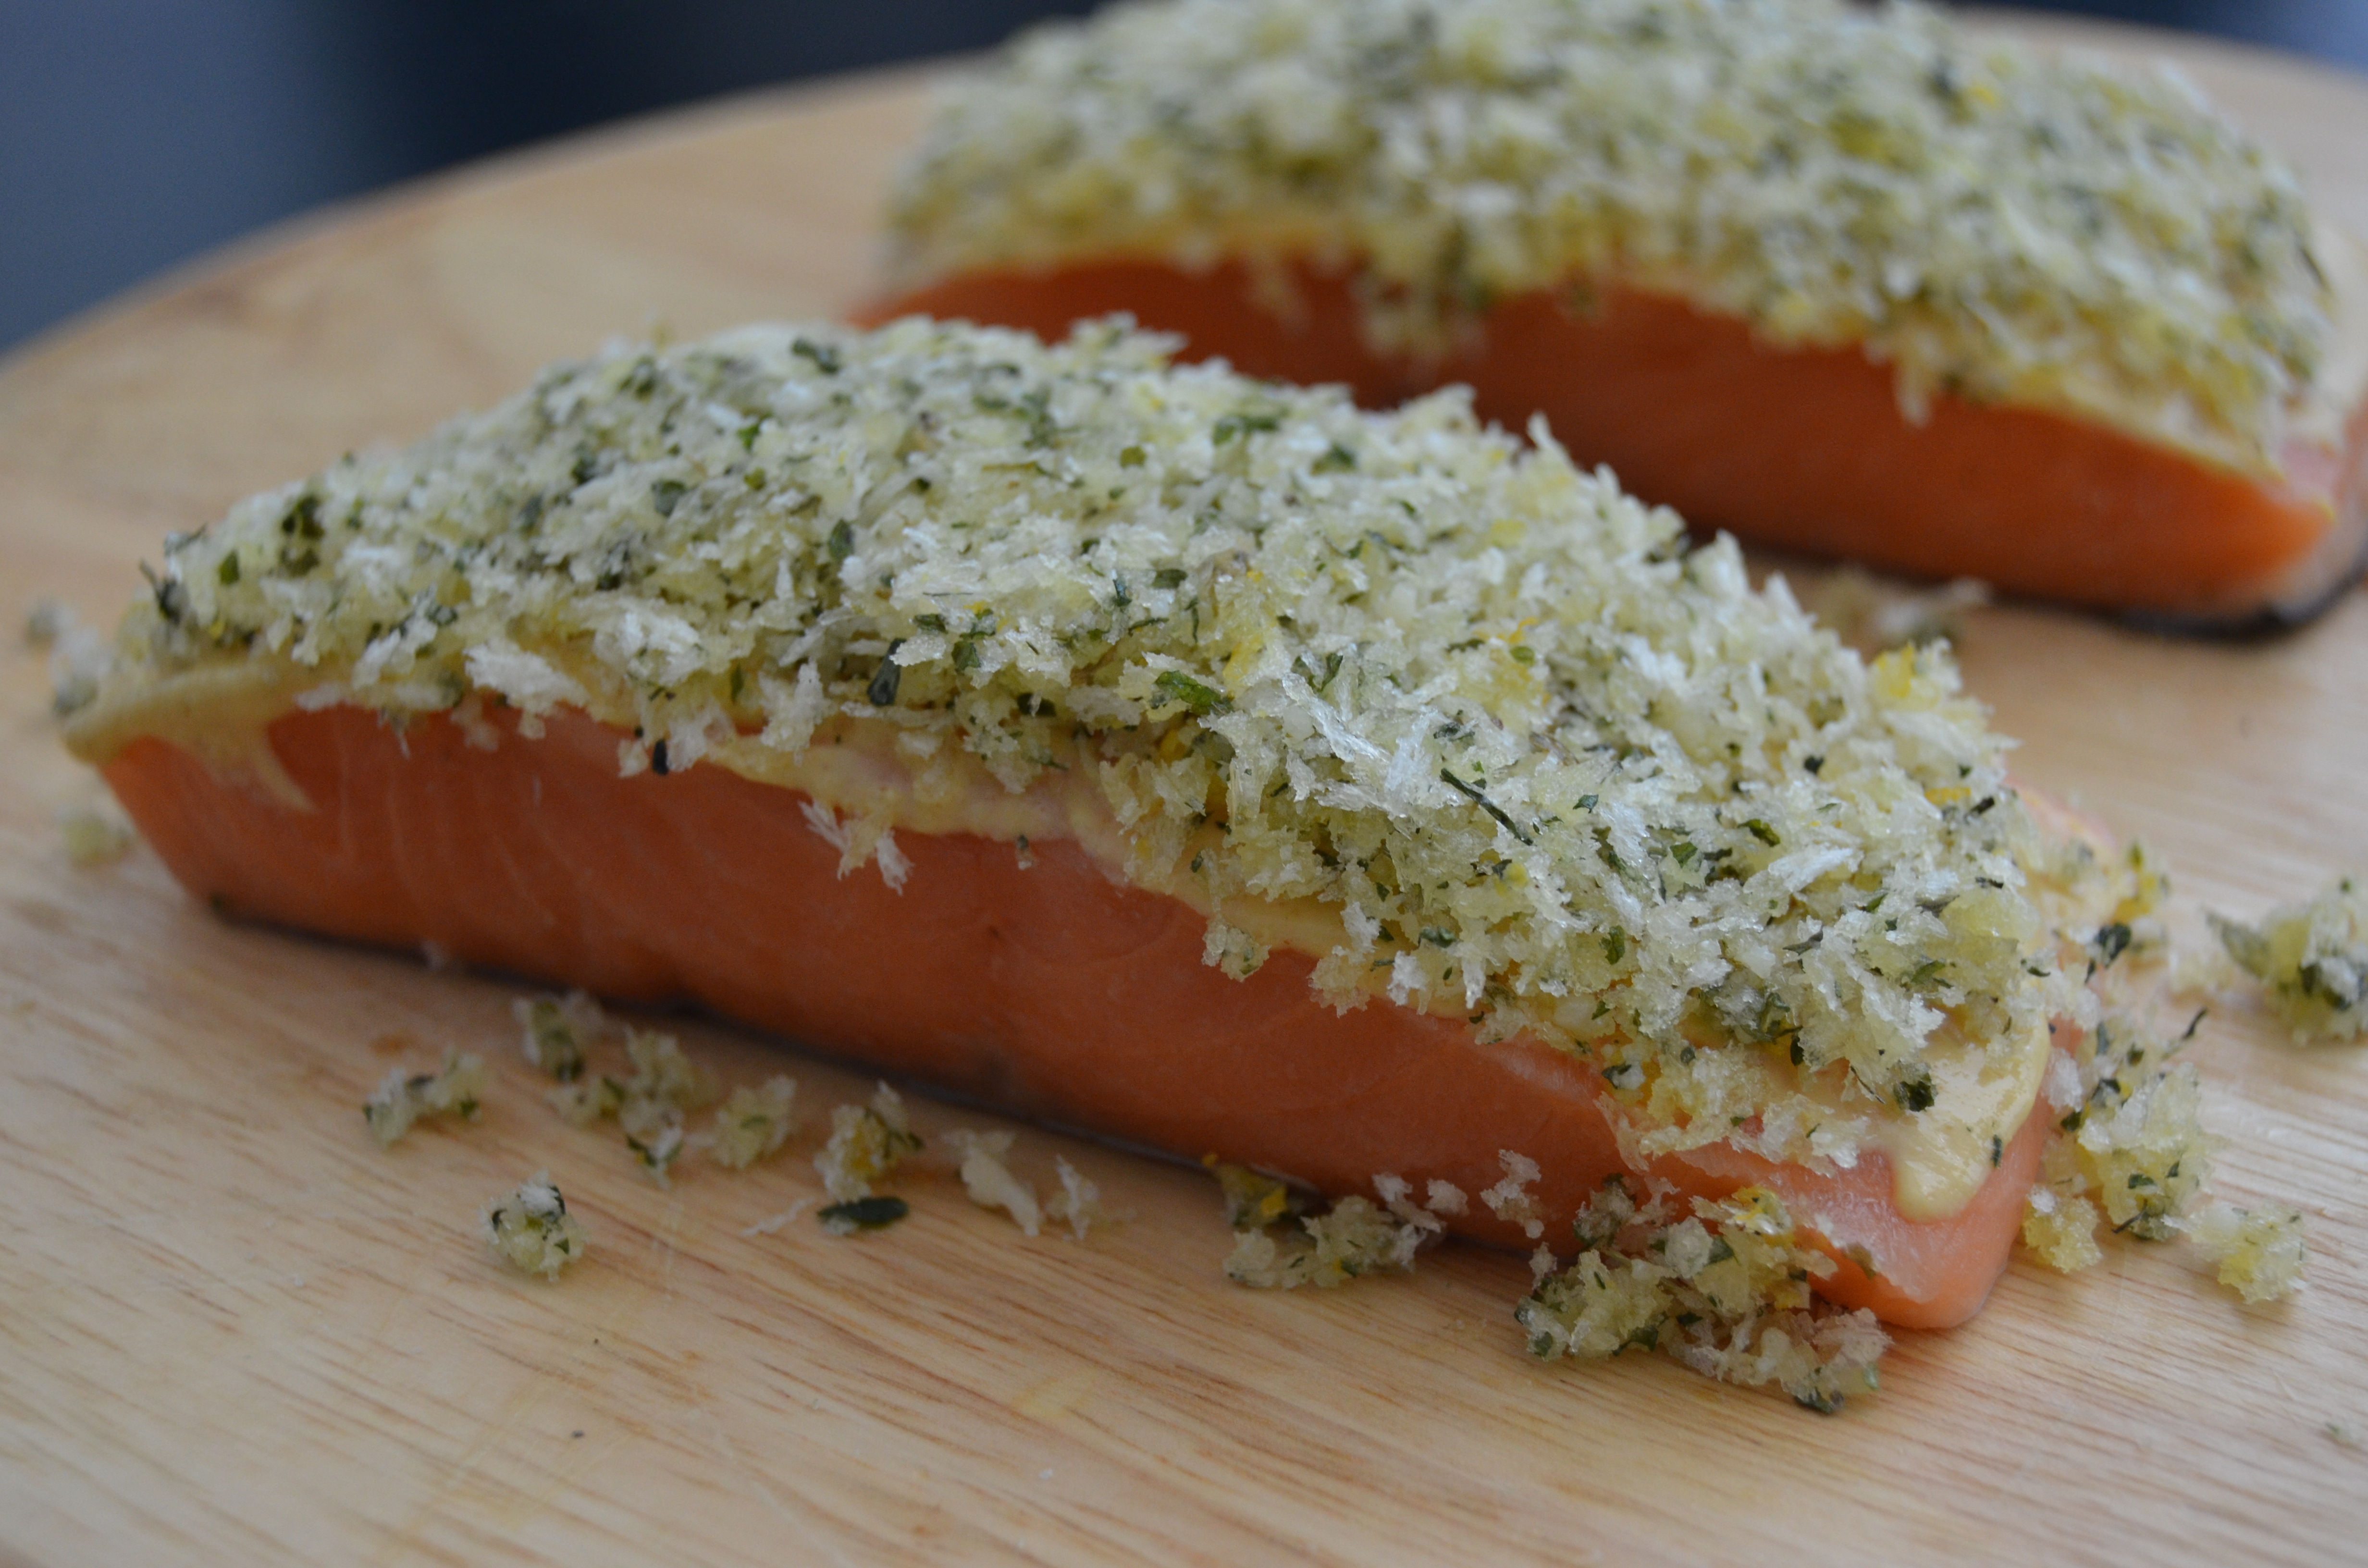 ... salmon filets skin down. Cook 3-4 minutes. Immediately transfer salmon